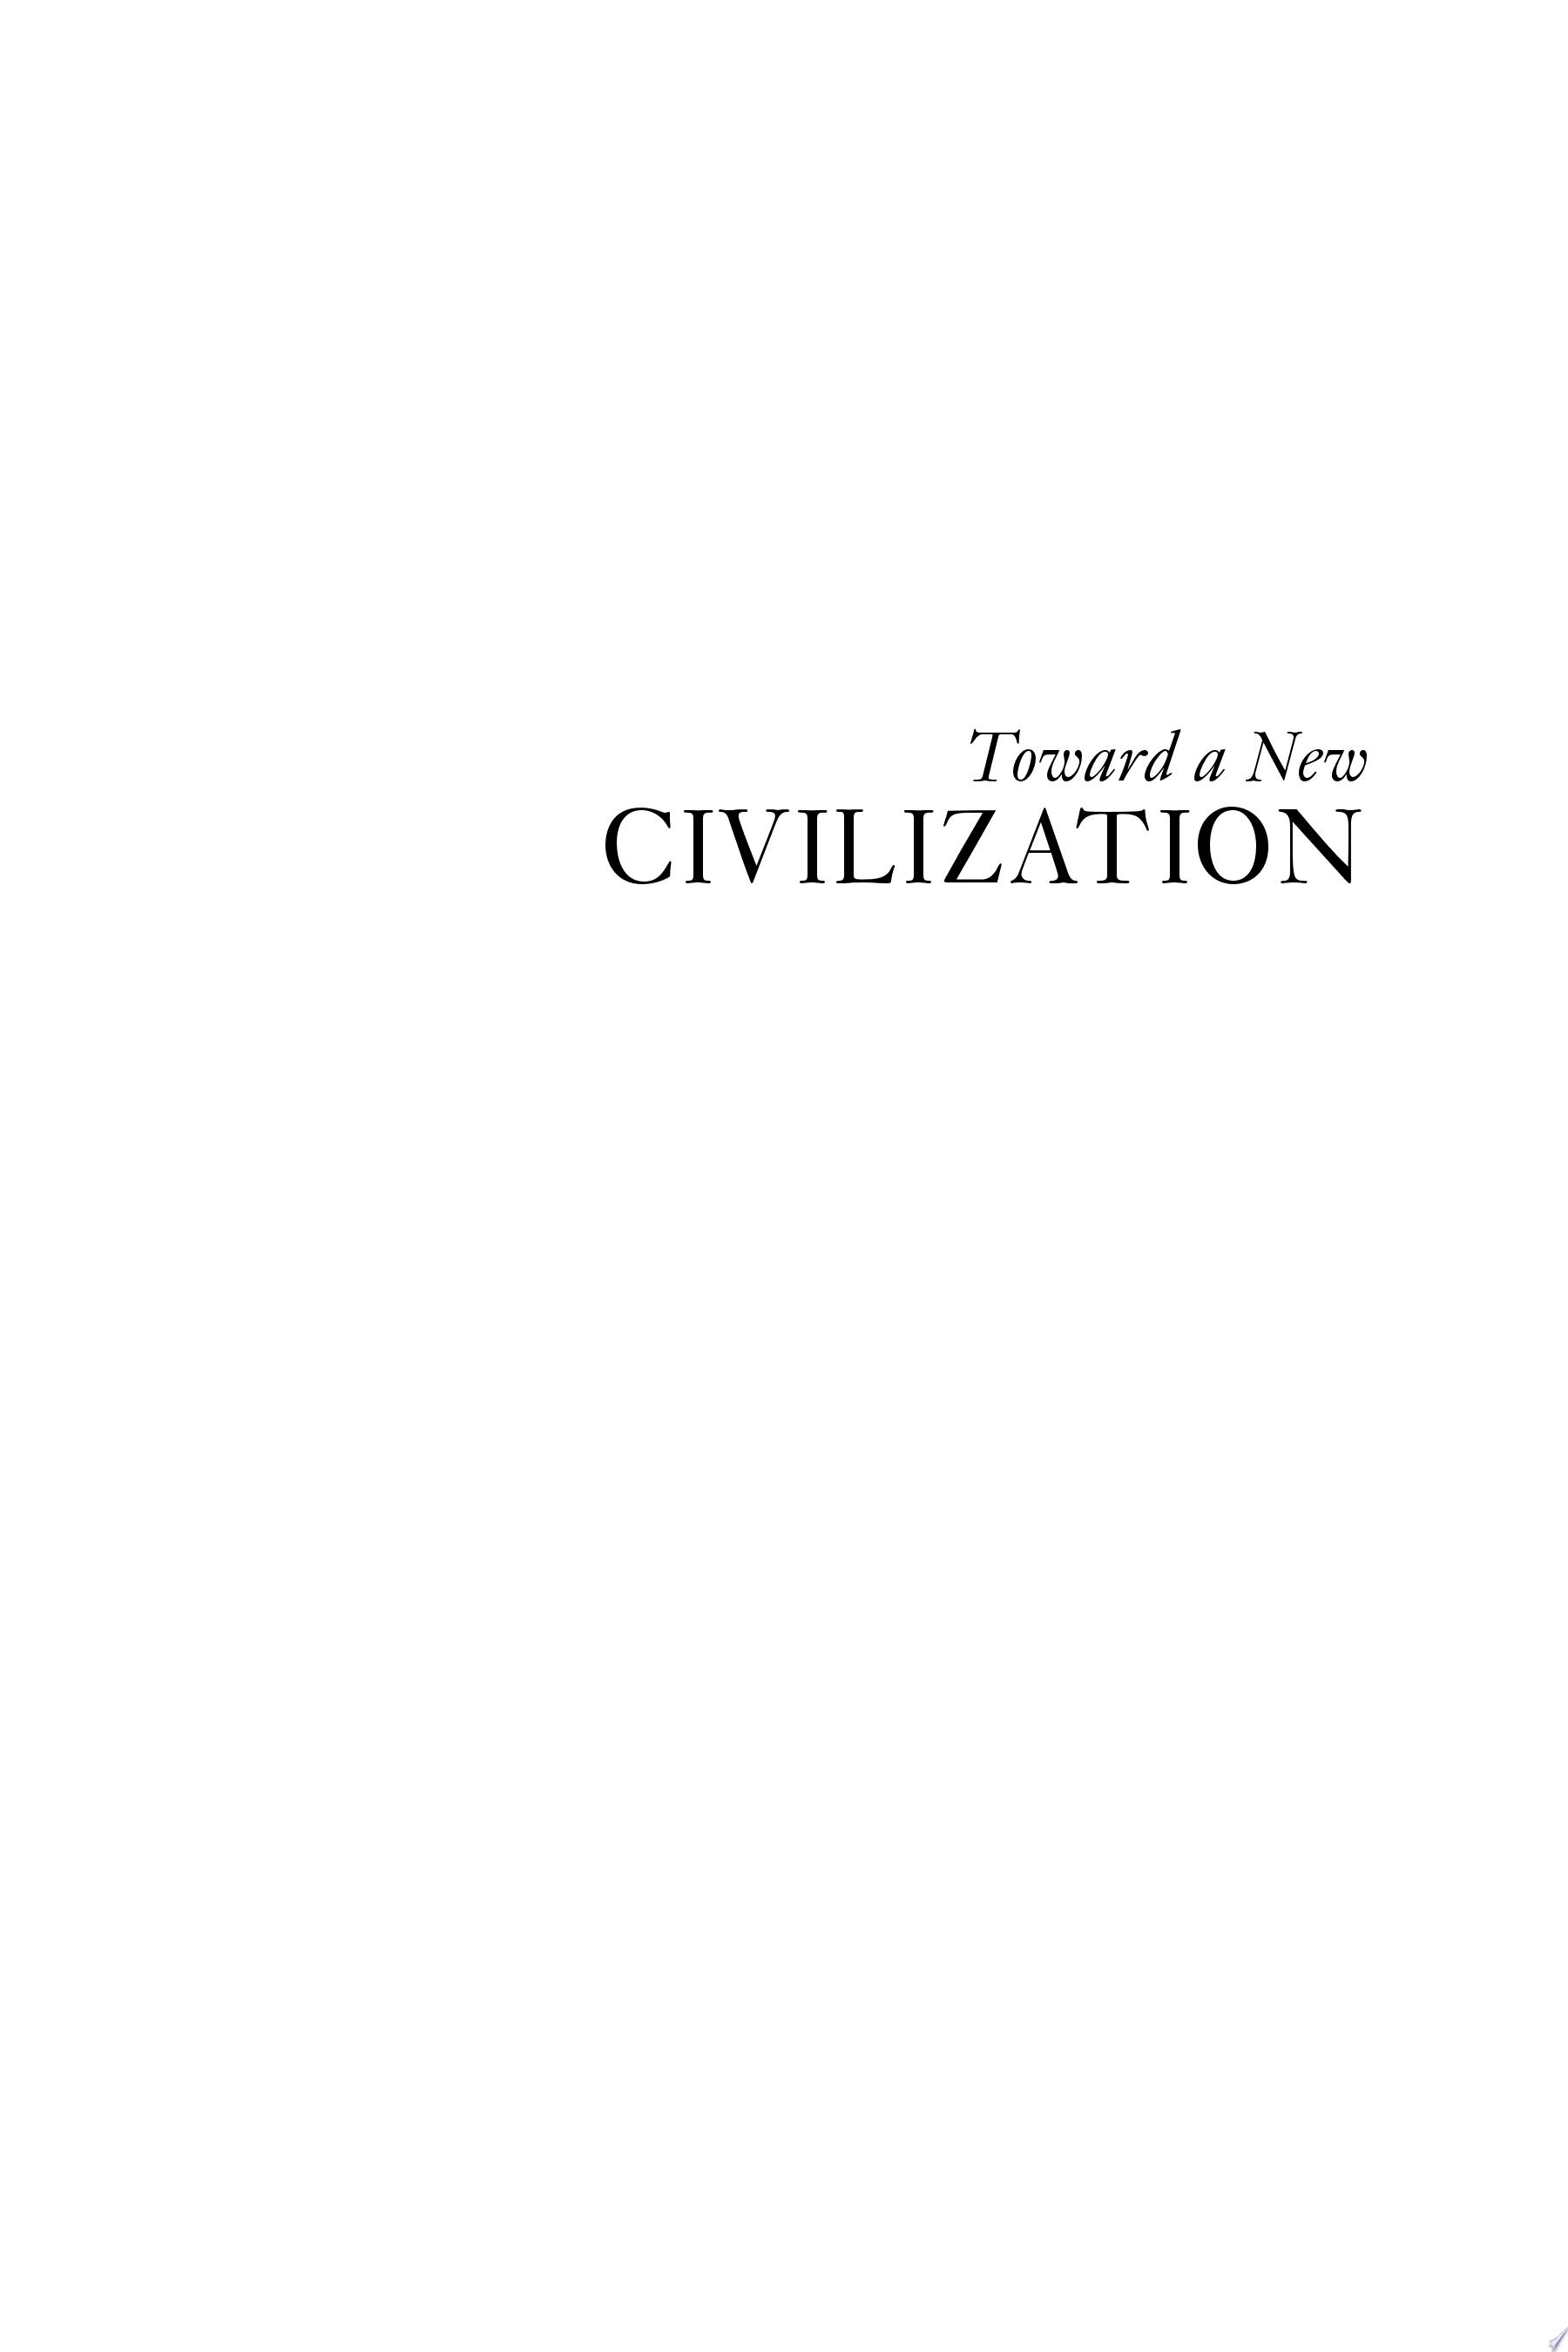 Toward a New Civilization